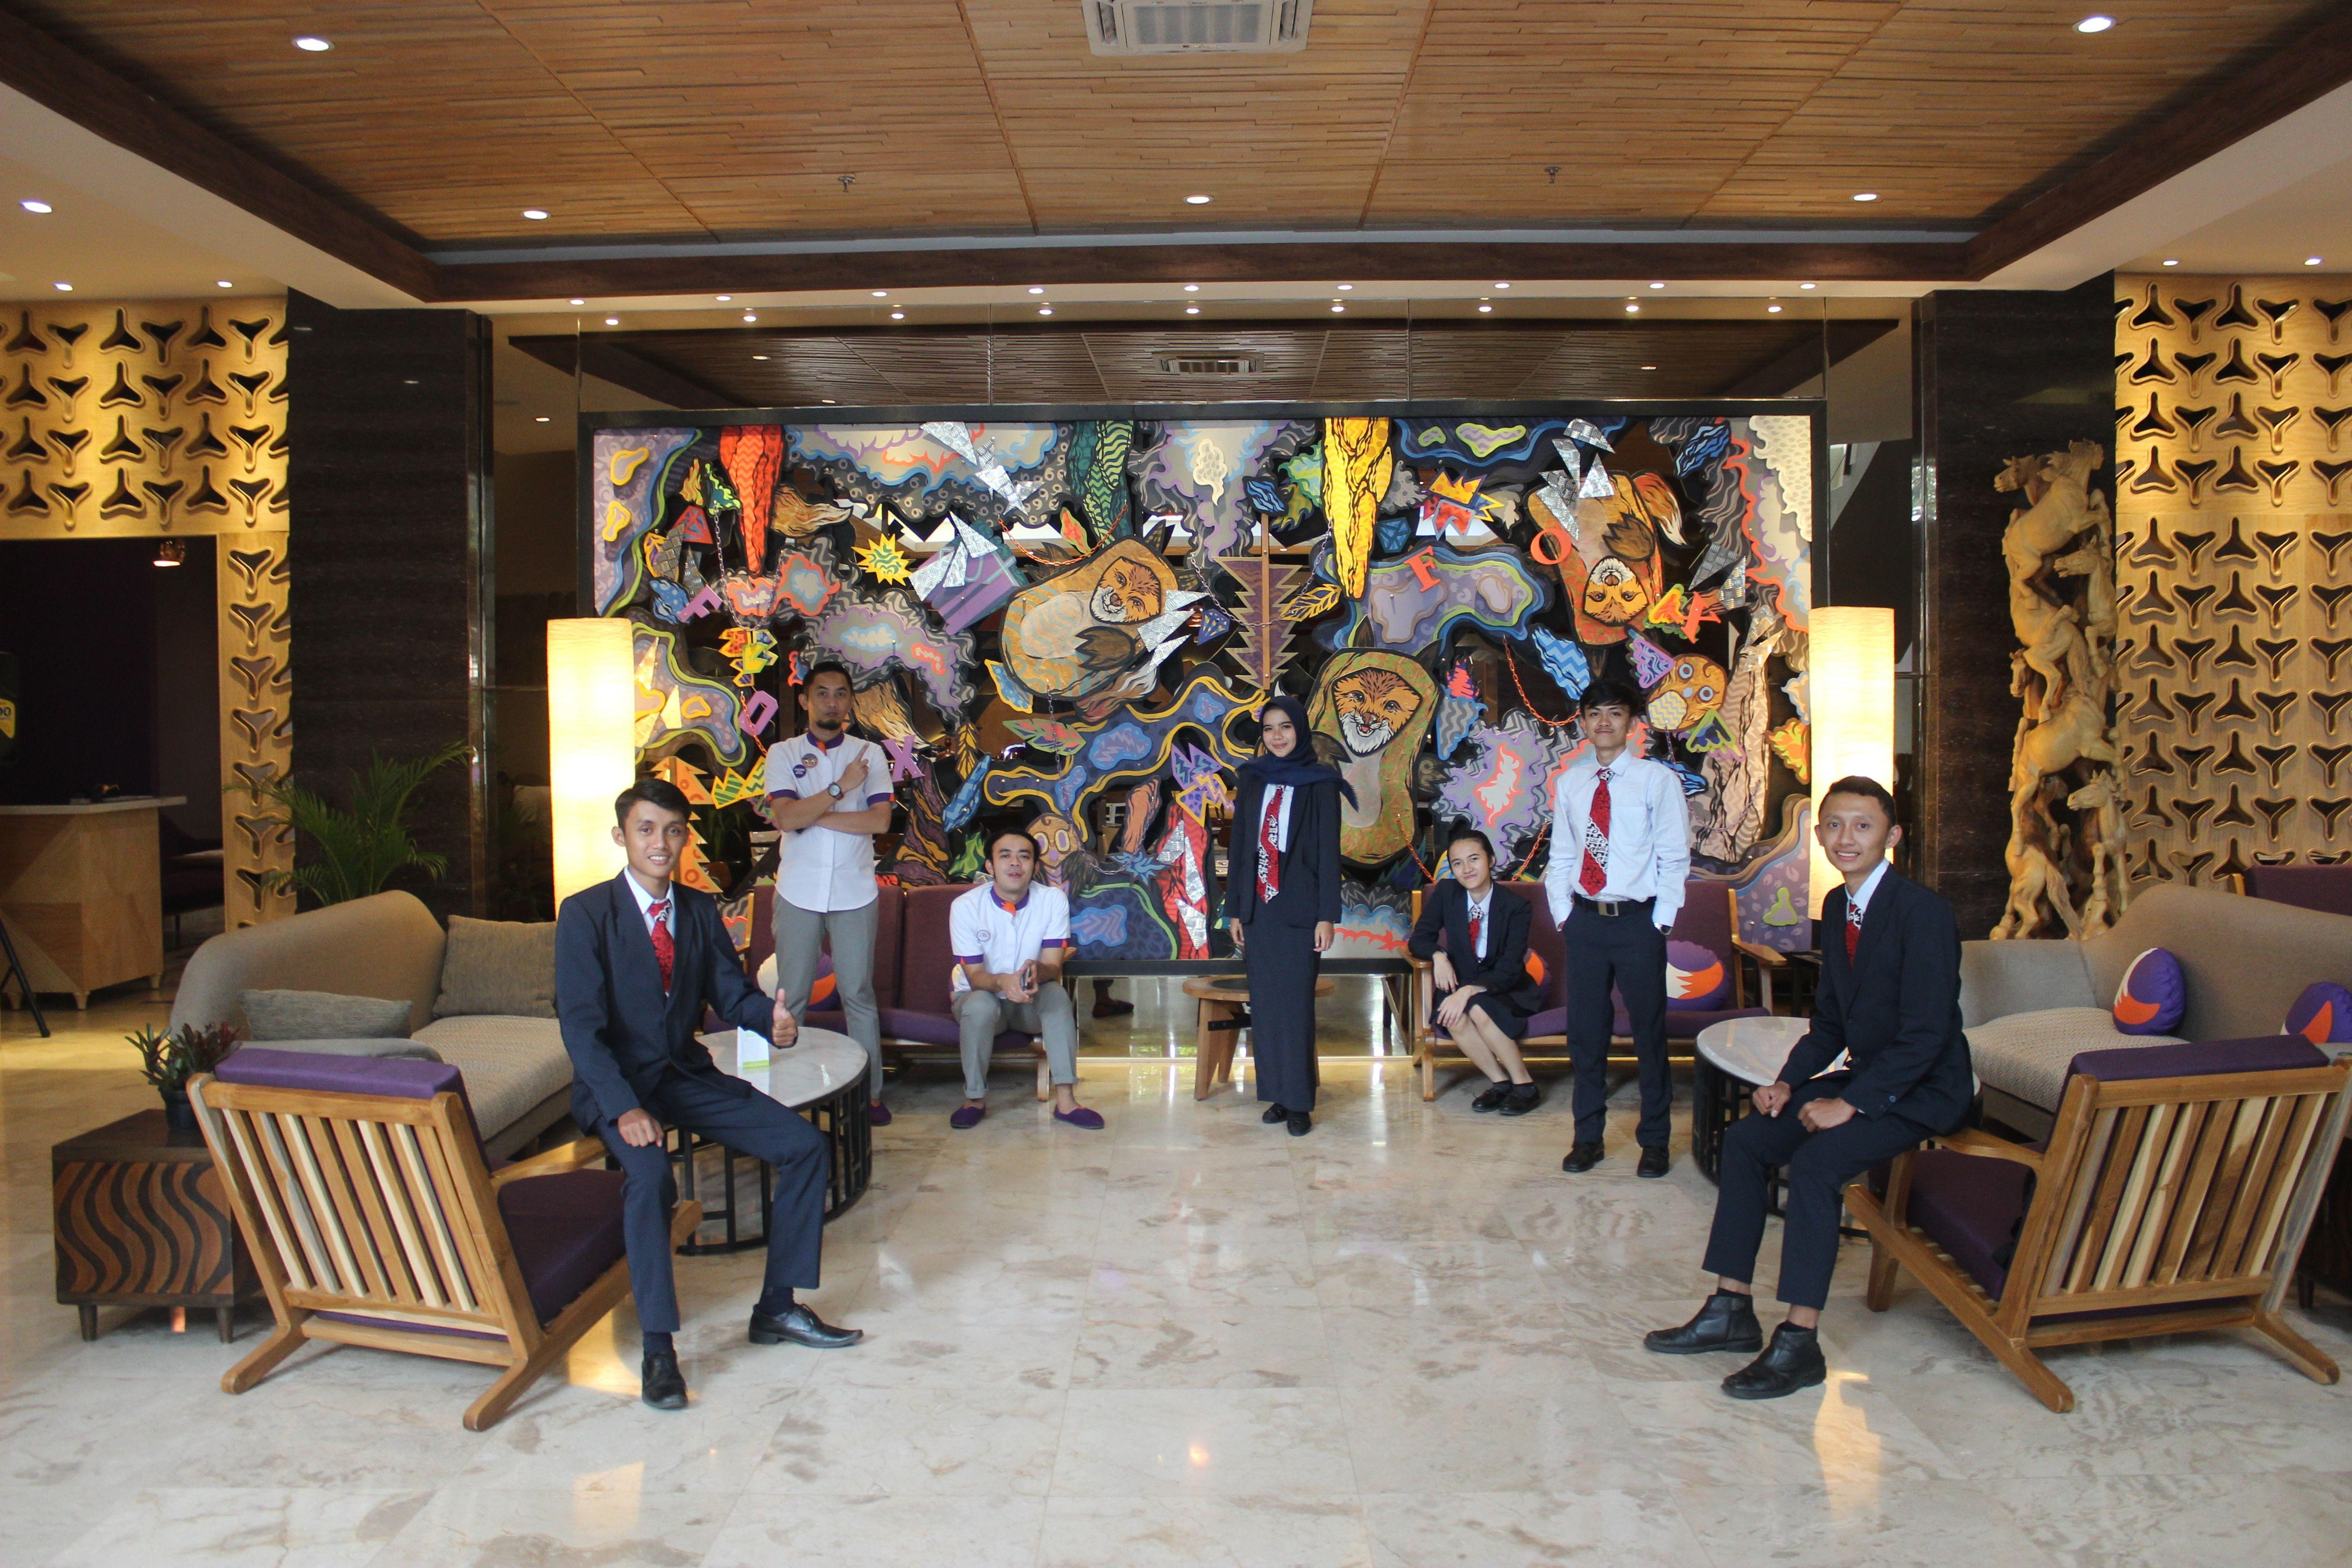 Kunjungan Industri Mahasiswa Paraiwisata ke Fox Harris Hotel Bandung